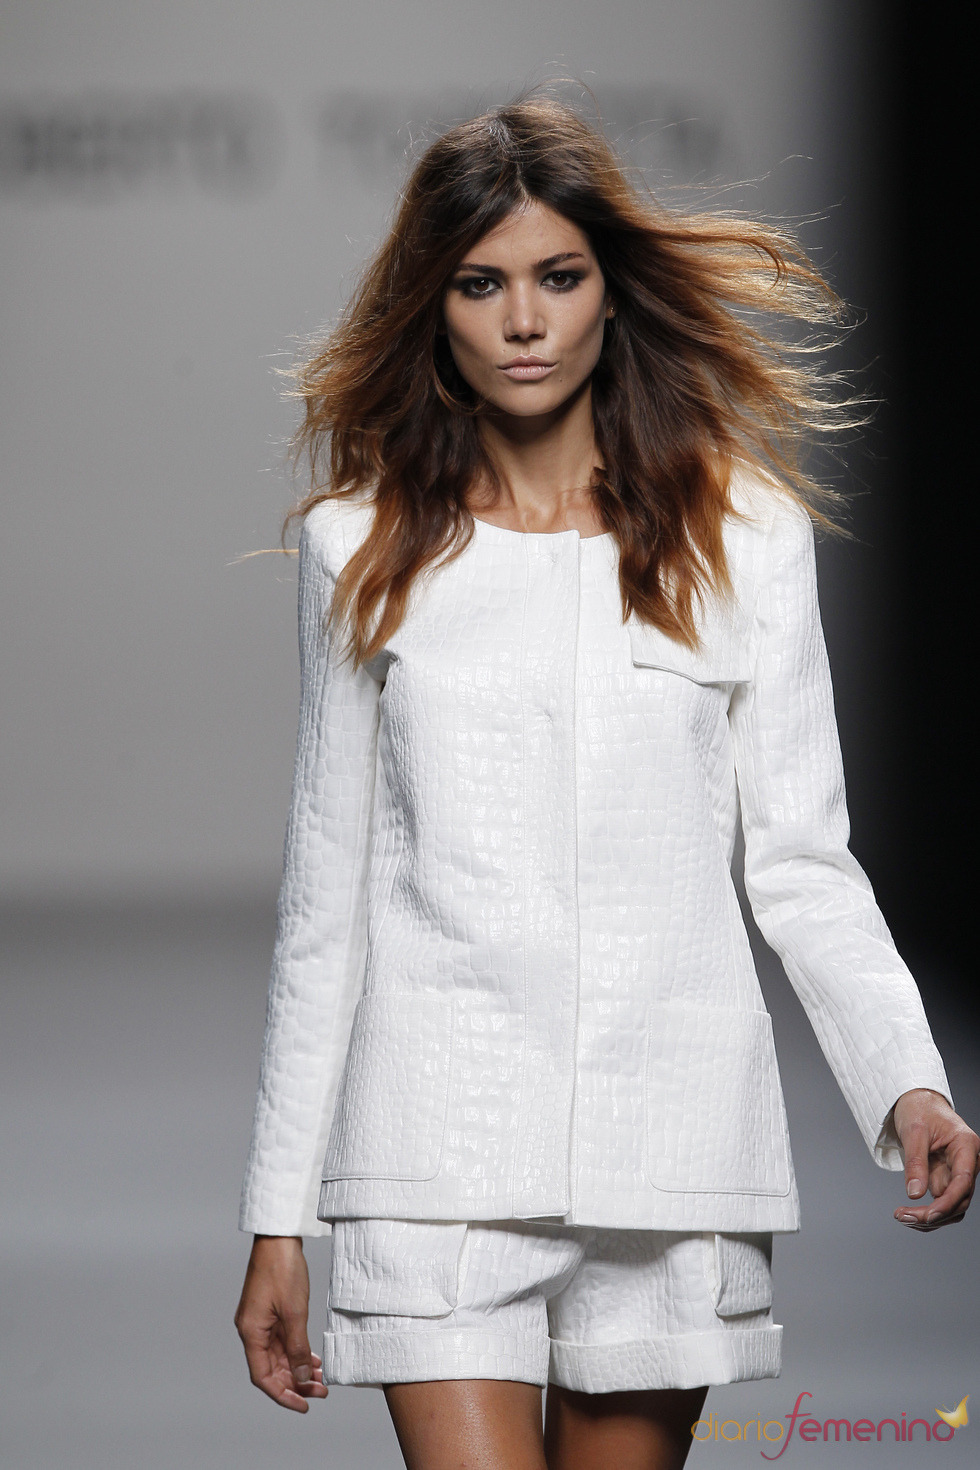 Conjunto blanco de Roberto Torretta para la primavera-verano 2011